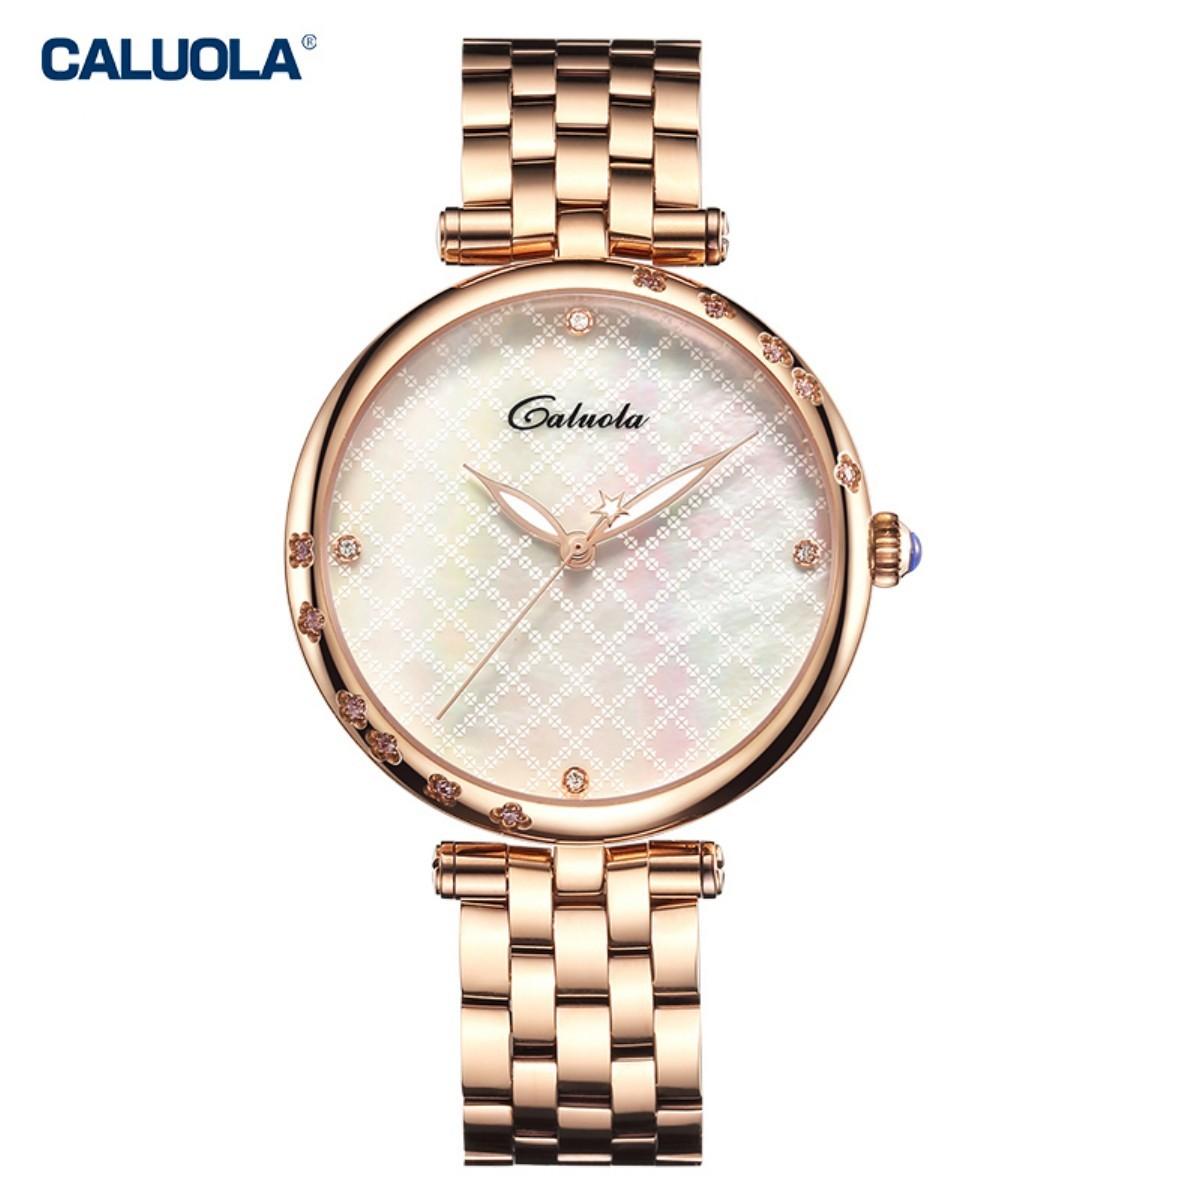 Caluola Women Watch 34mm Rose Gold CA1190